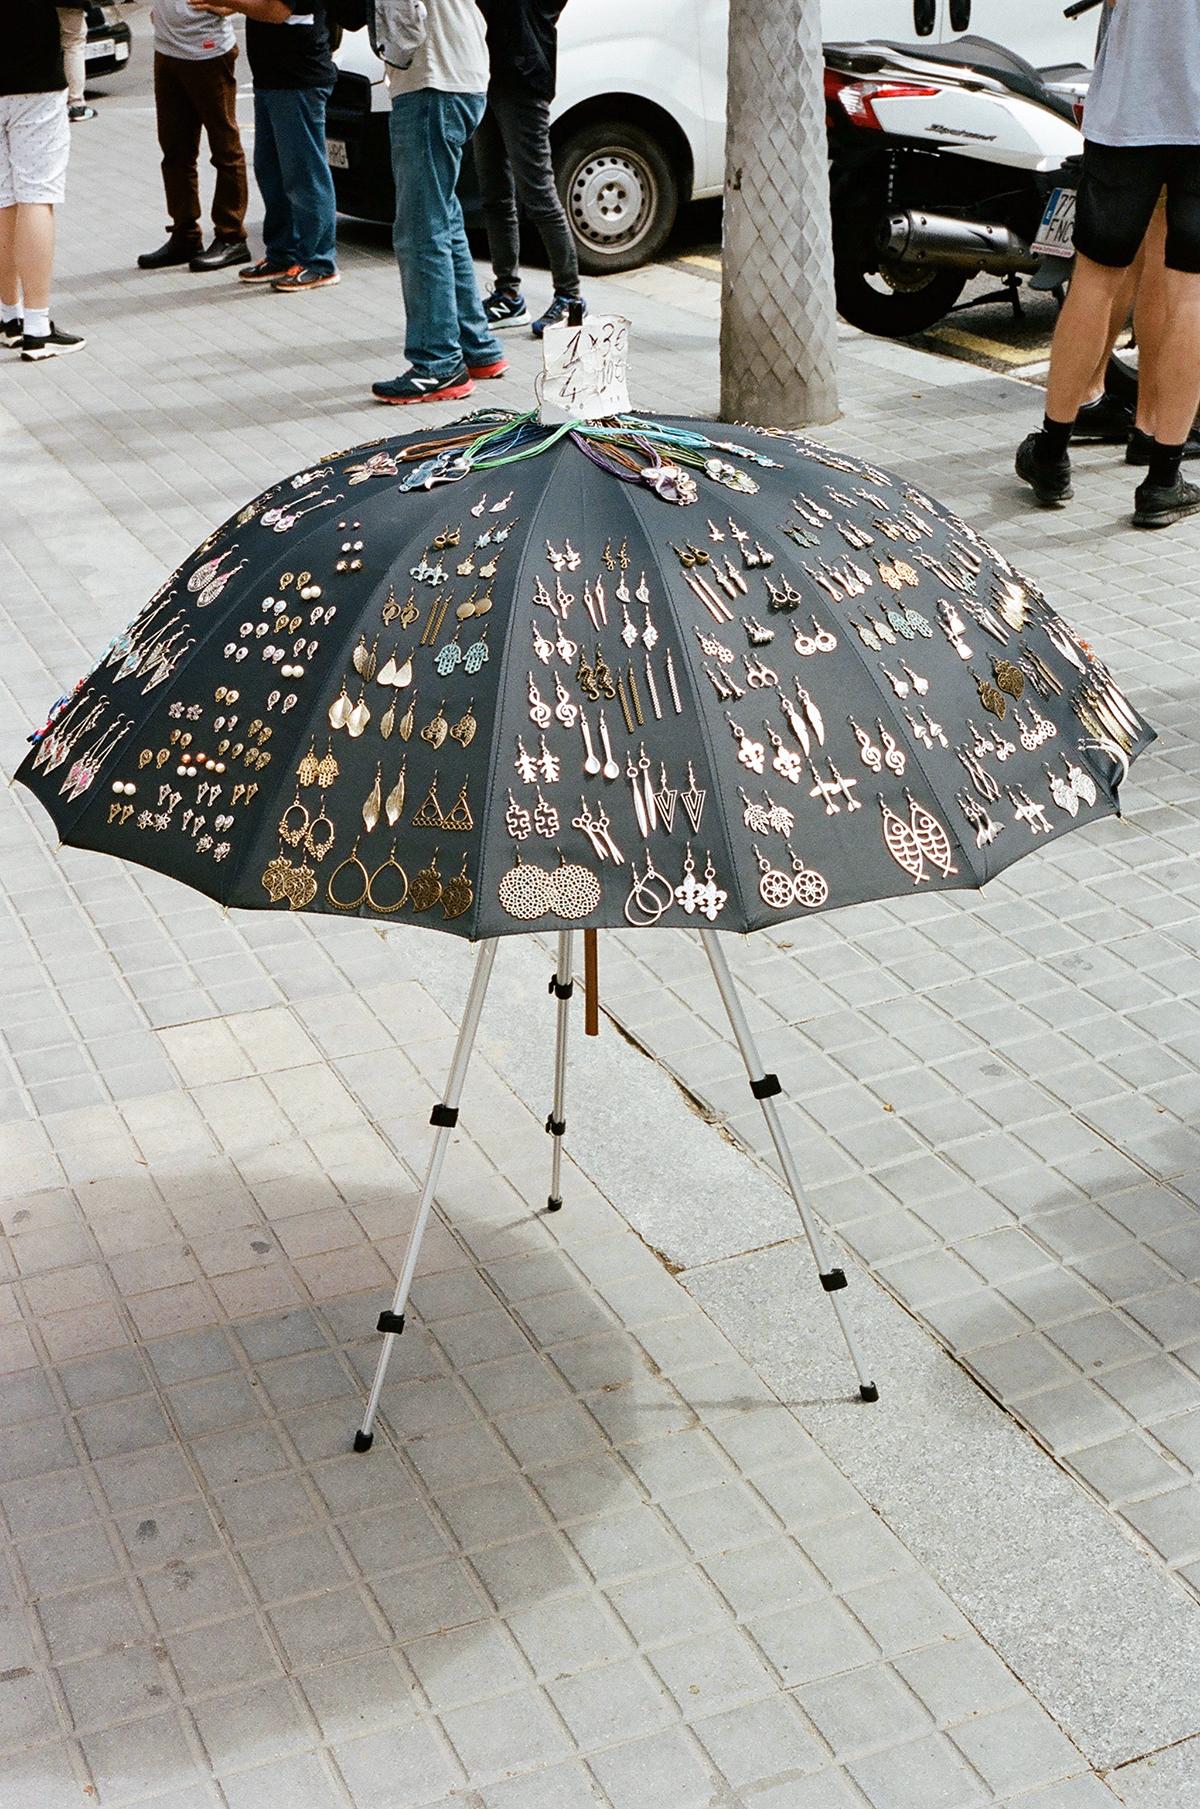 umbrellamerchdisplayweb.jpg